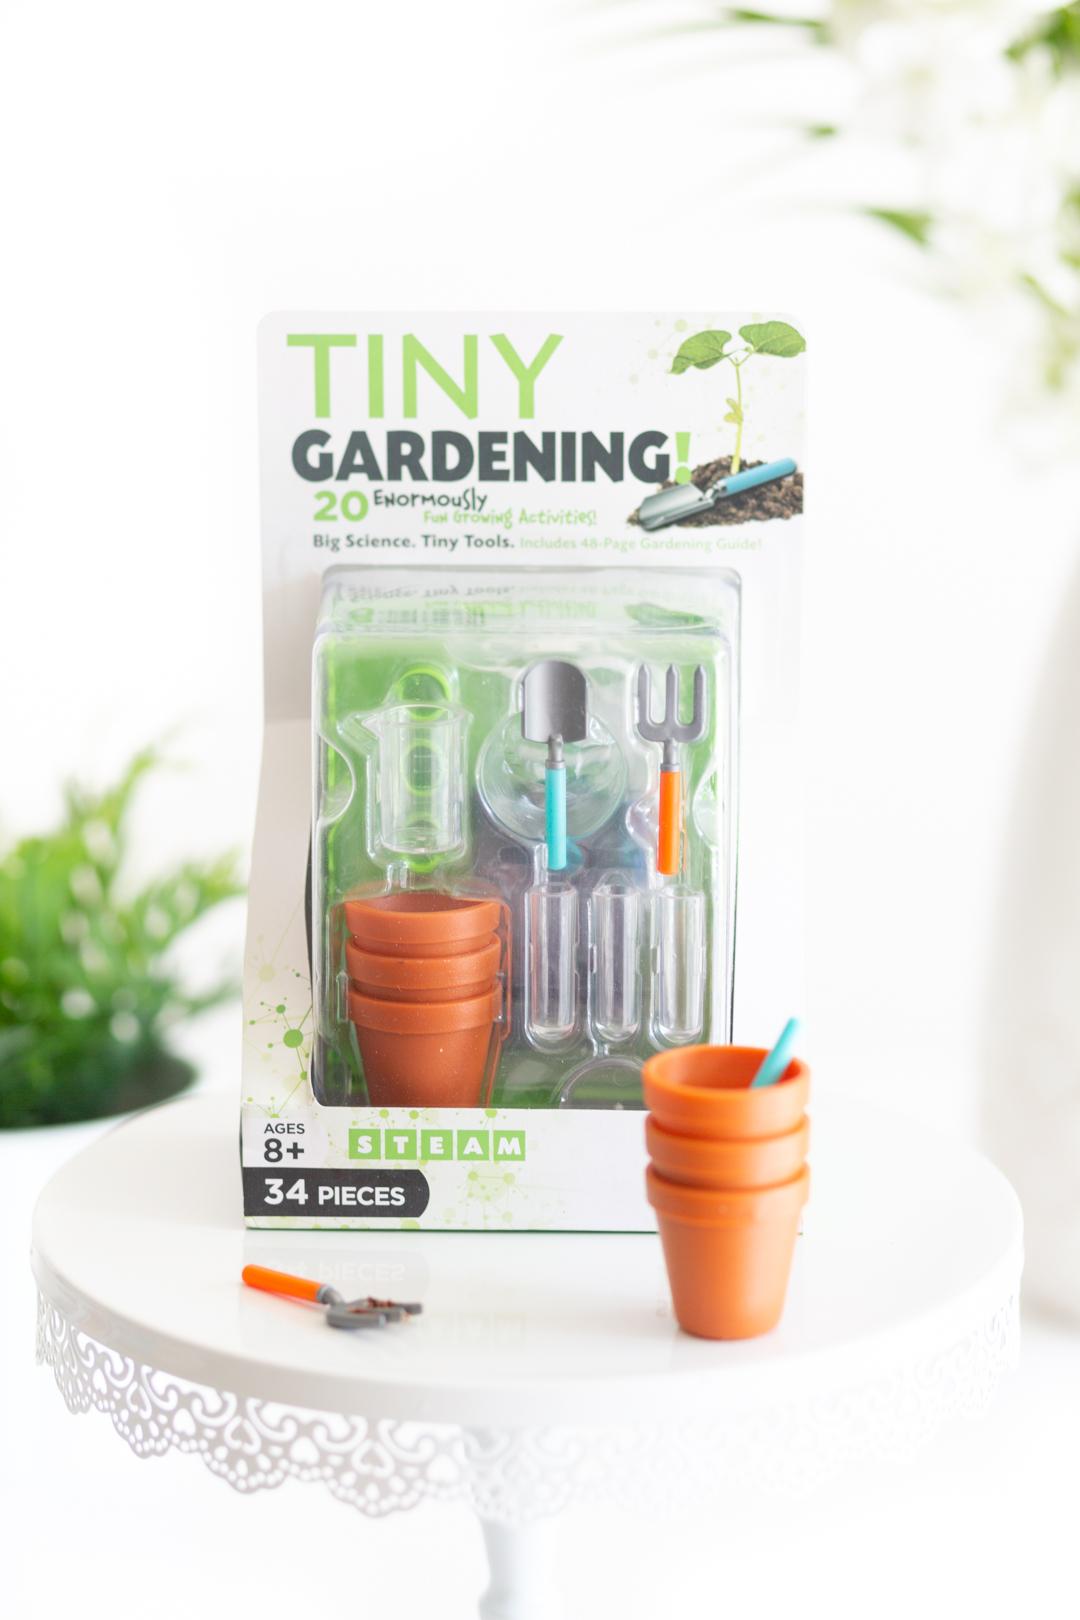 tiny gardening kit complete with mini greenhouse, mini planting posts